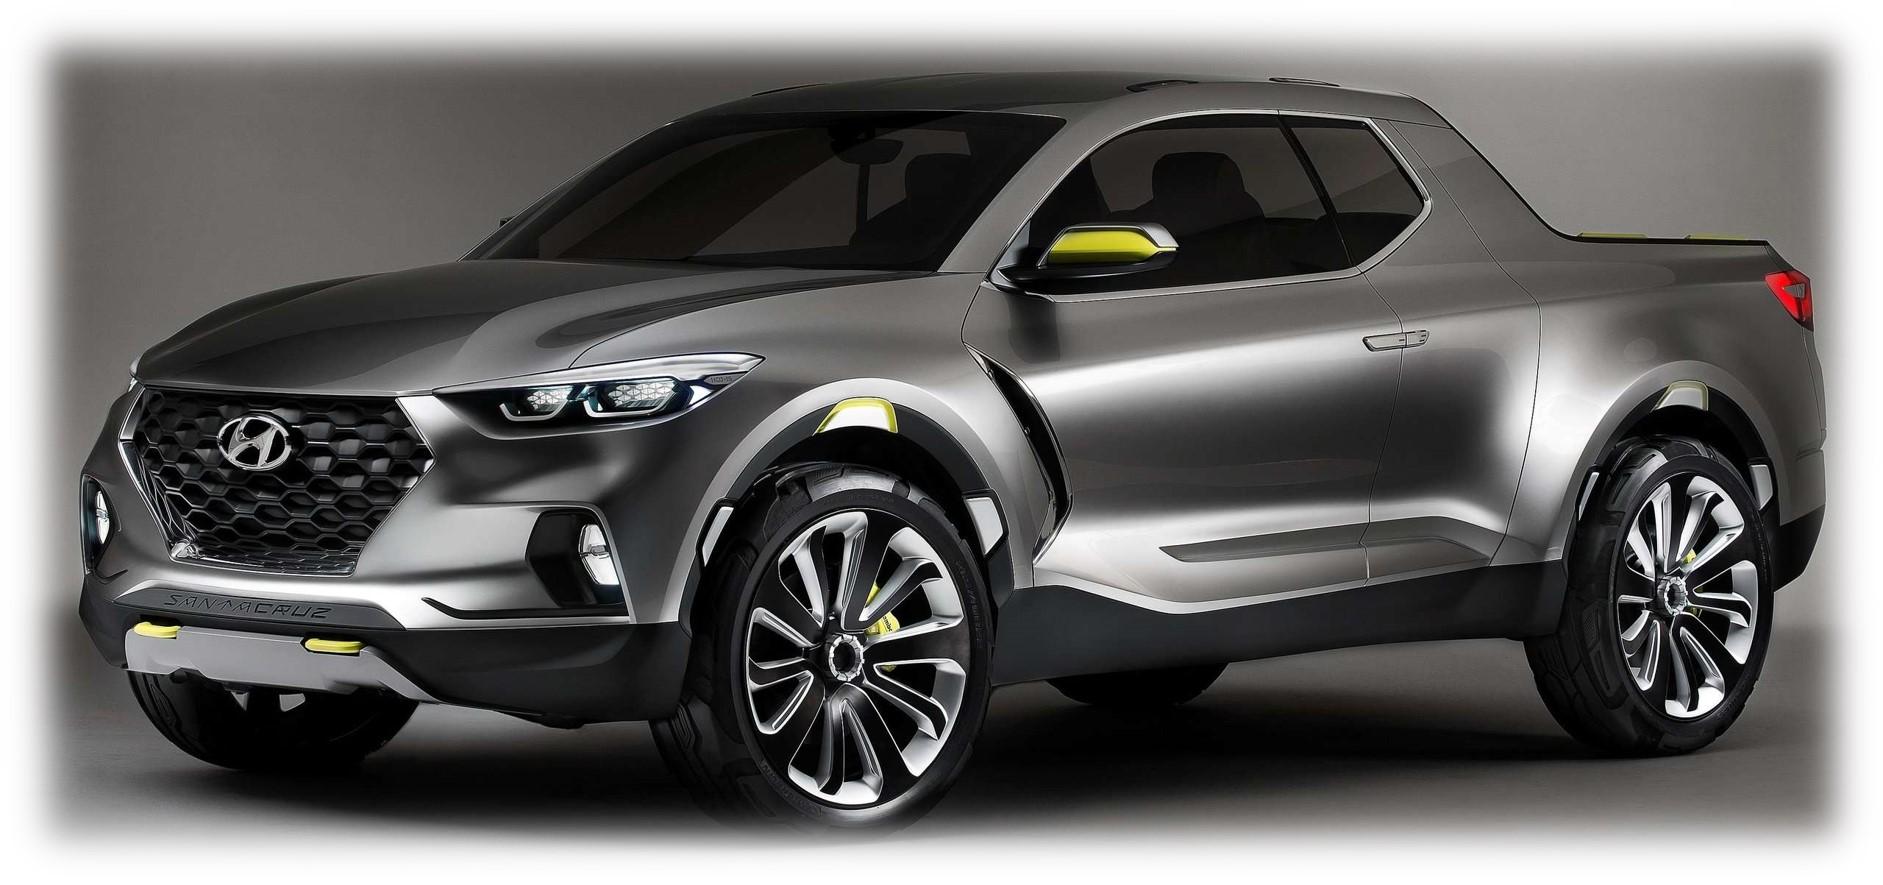 Hyundai Santa Cruz Crossover Truck Concept